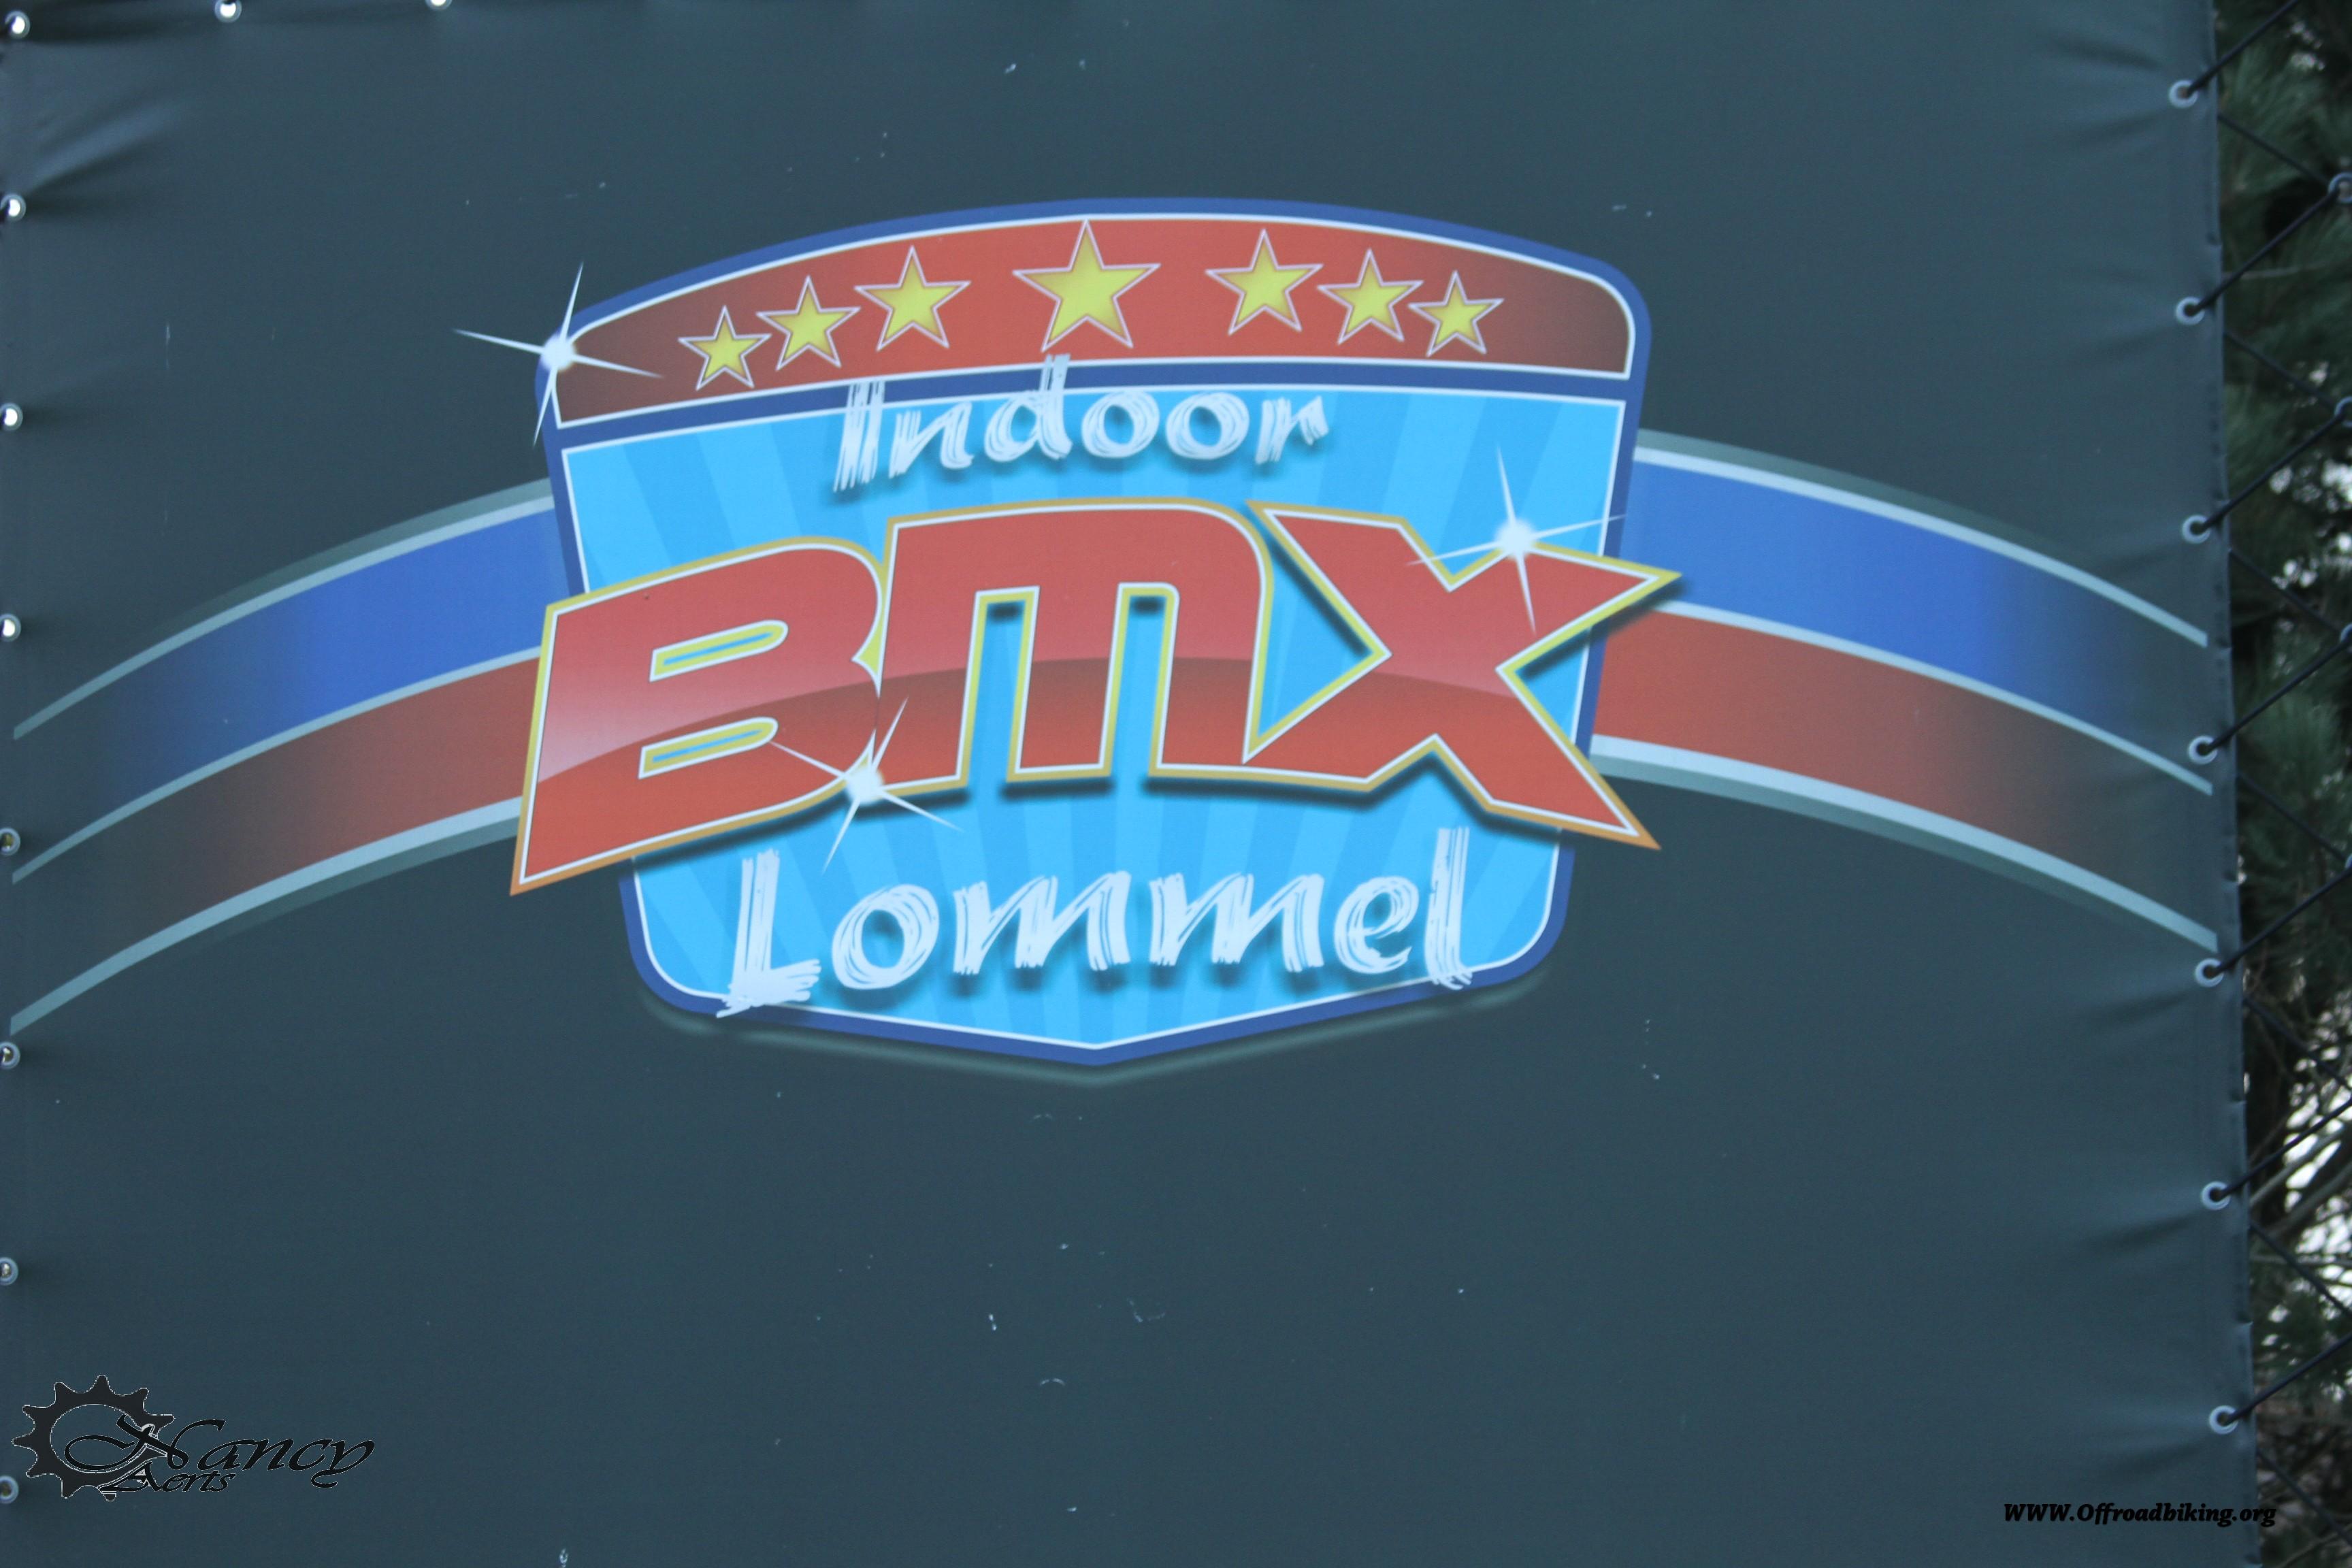 Indoor BMX Lommel 2015